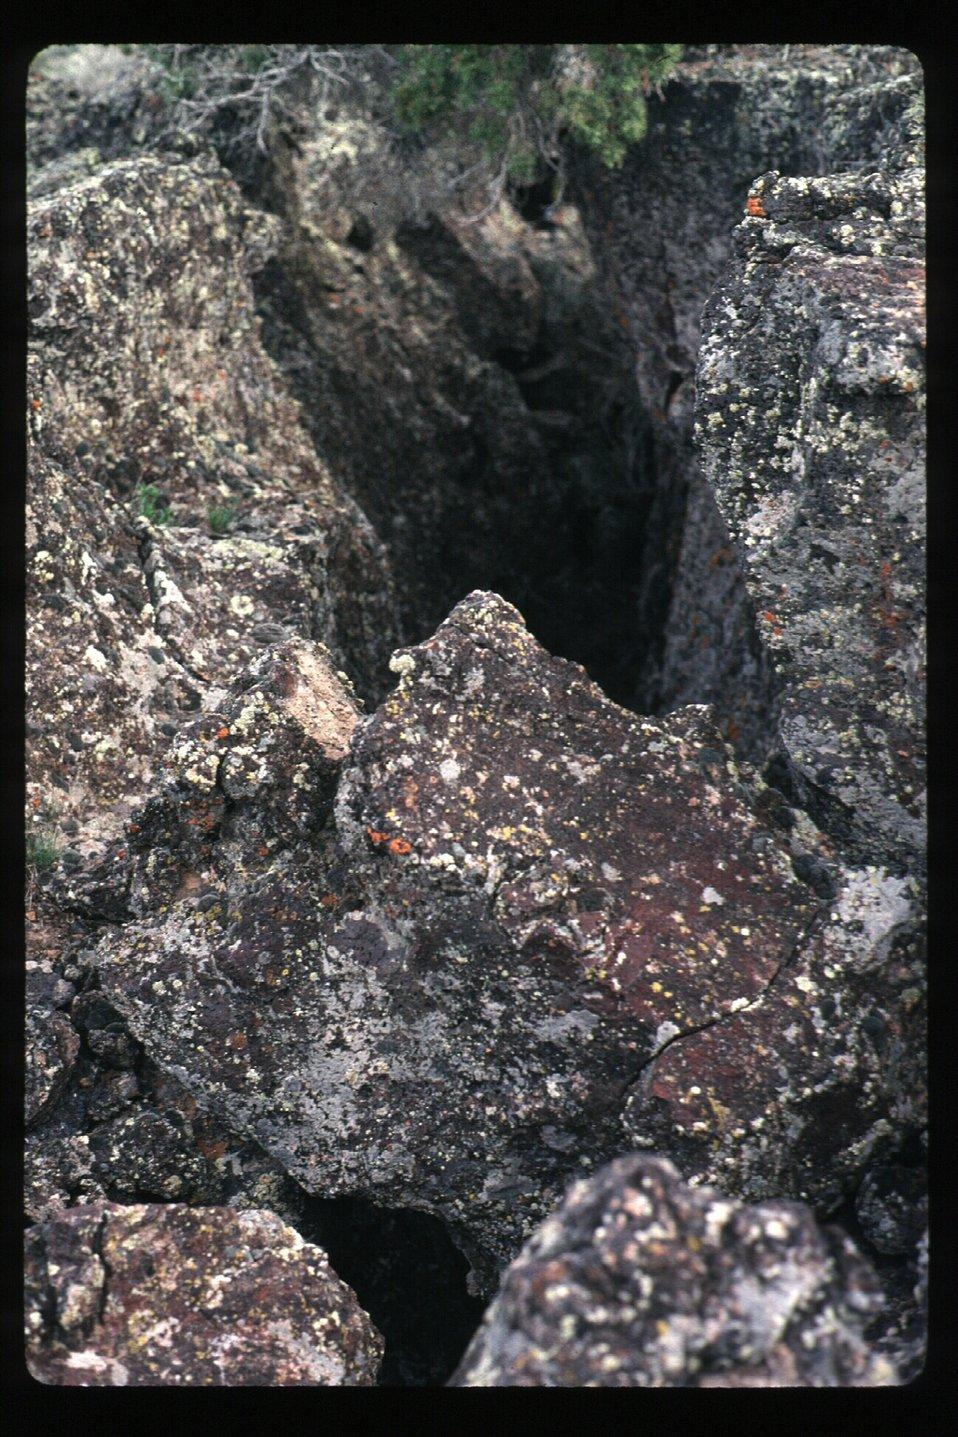 Hells Half Acre  Lichen on rocks  Wilderness  Idaho Falls Field Office  USRD  Upper Snake River District